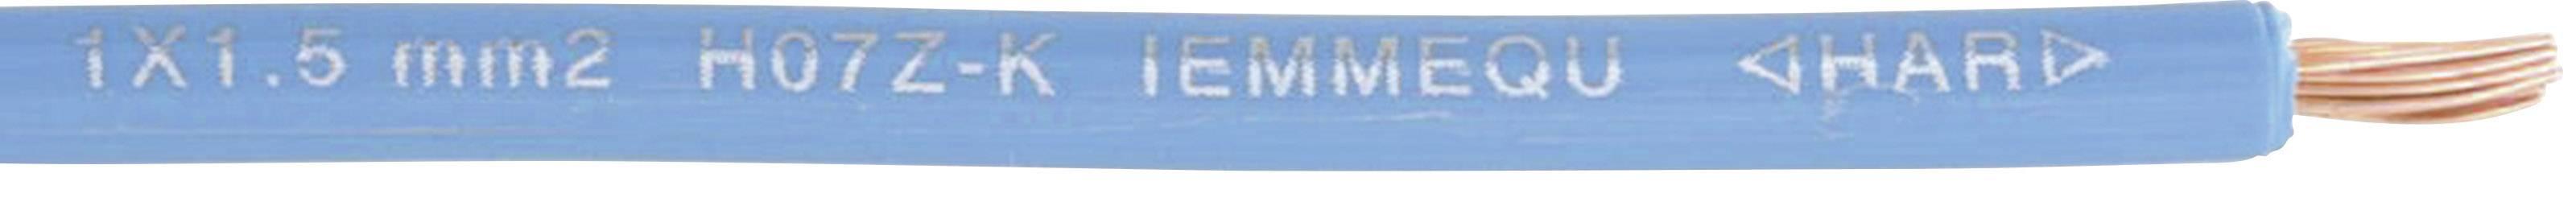 Opletenie / lanko Faber Kabel 040267 H07Z-K, 1 x 1.50 mm², vonkajší Ø 3.10 mm, 100 m, svetlomodrá